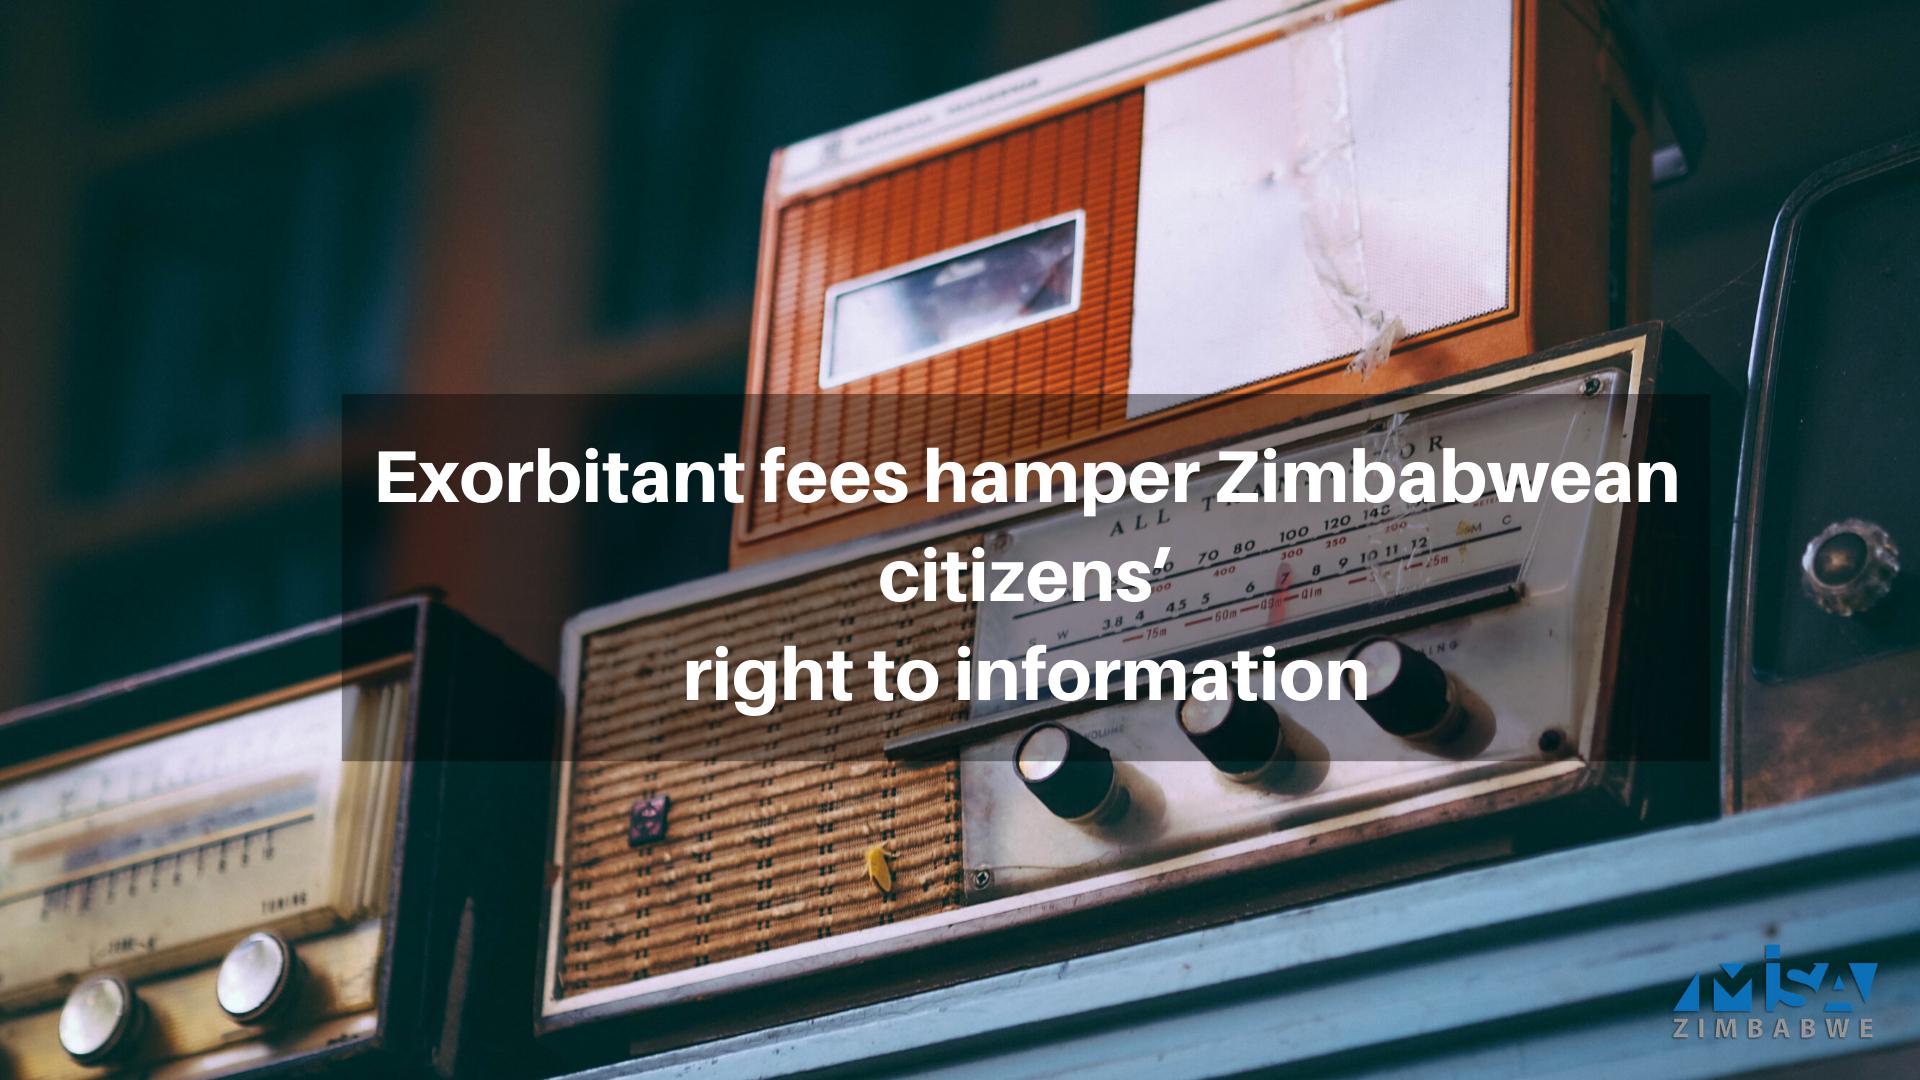 Exorbitant fees hamper Zimbabwean citizens' right to information